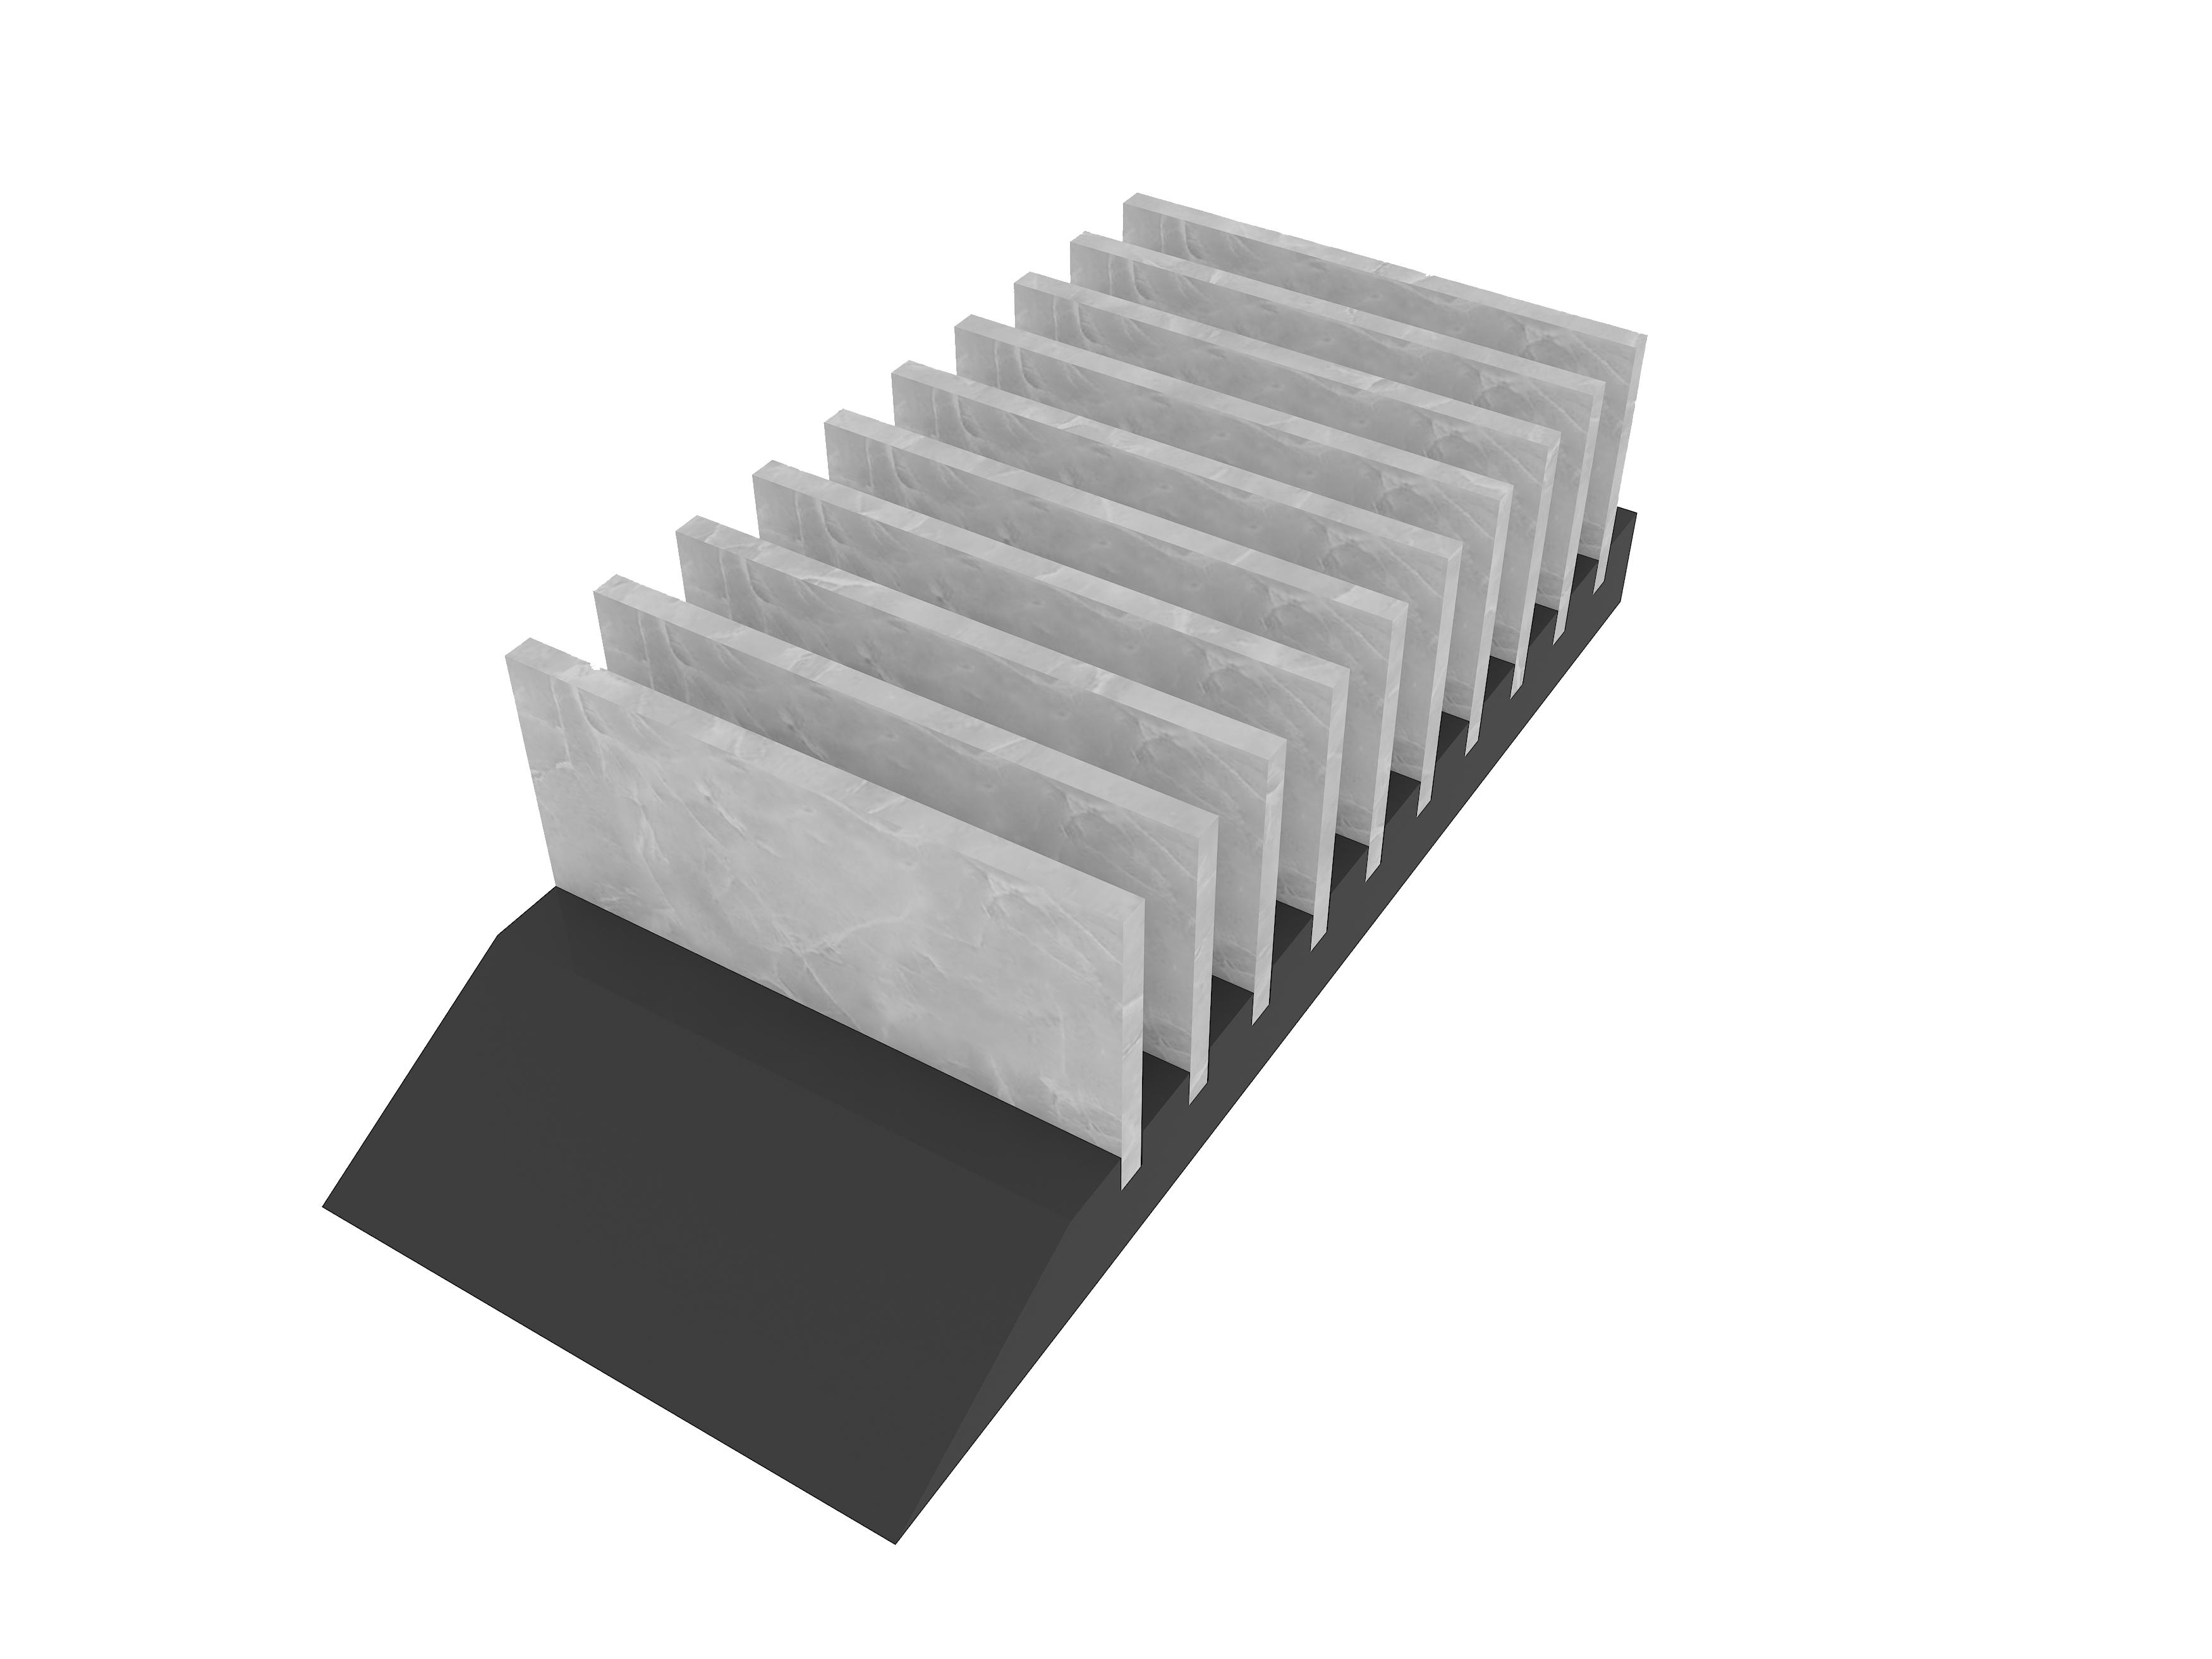 modern-tile-countertop-stand-ceramic-tile-holders-ST-33-2